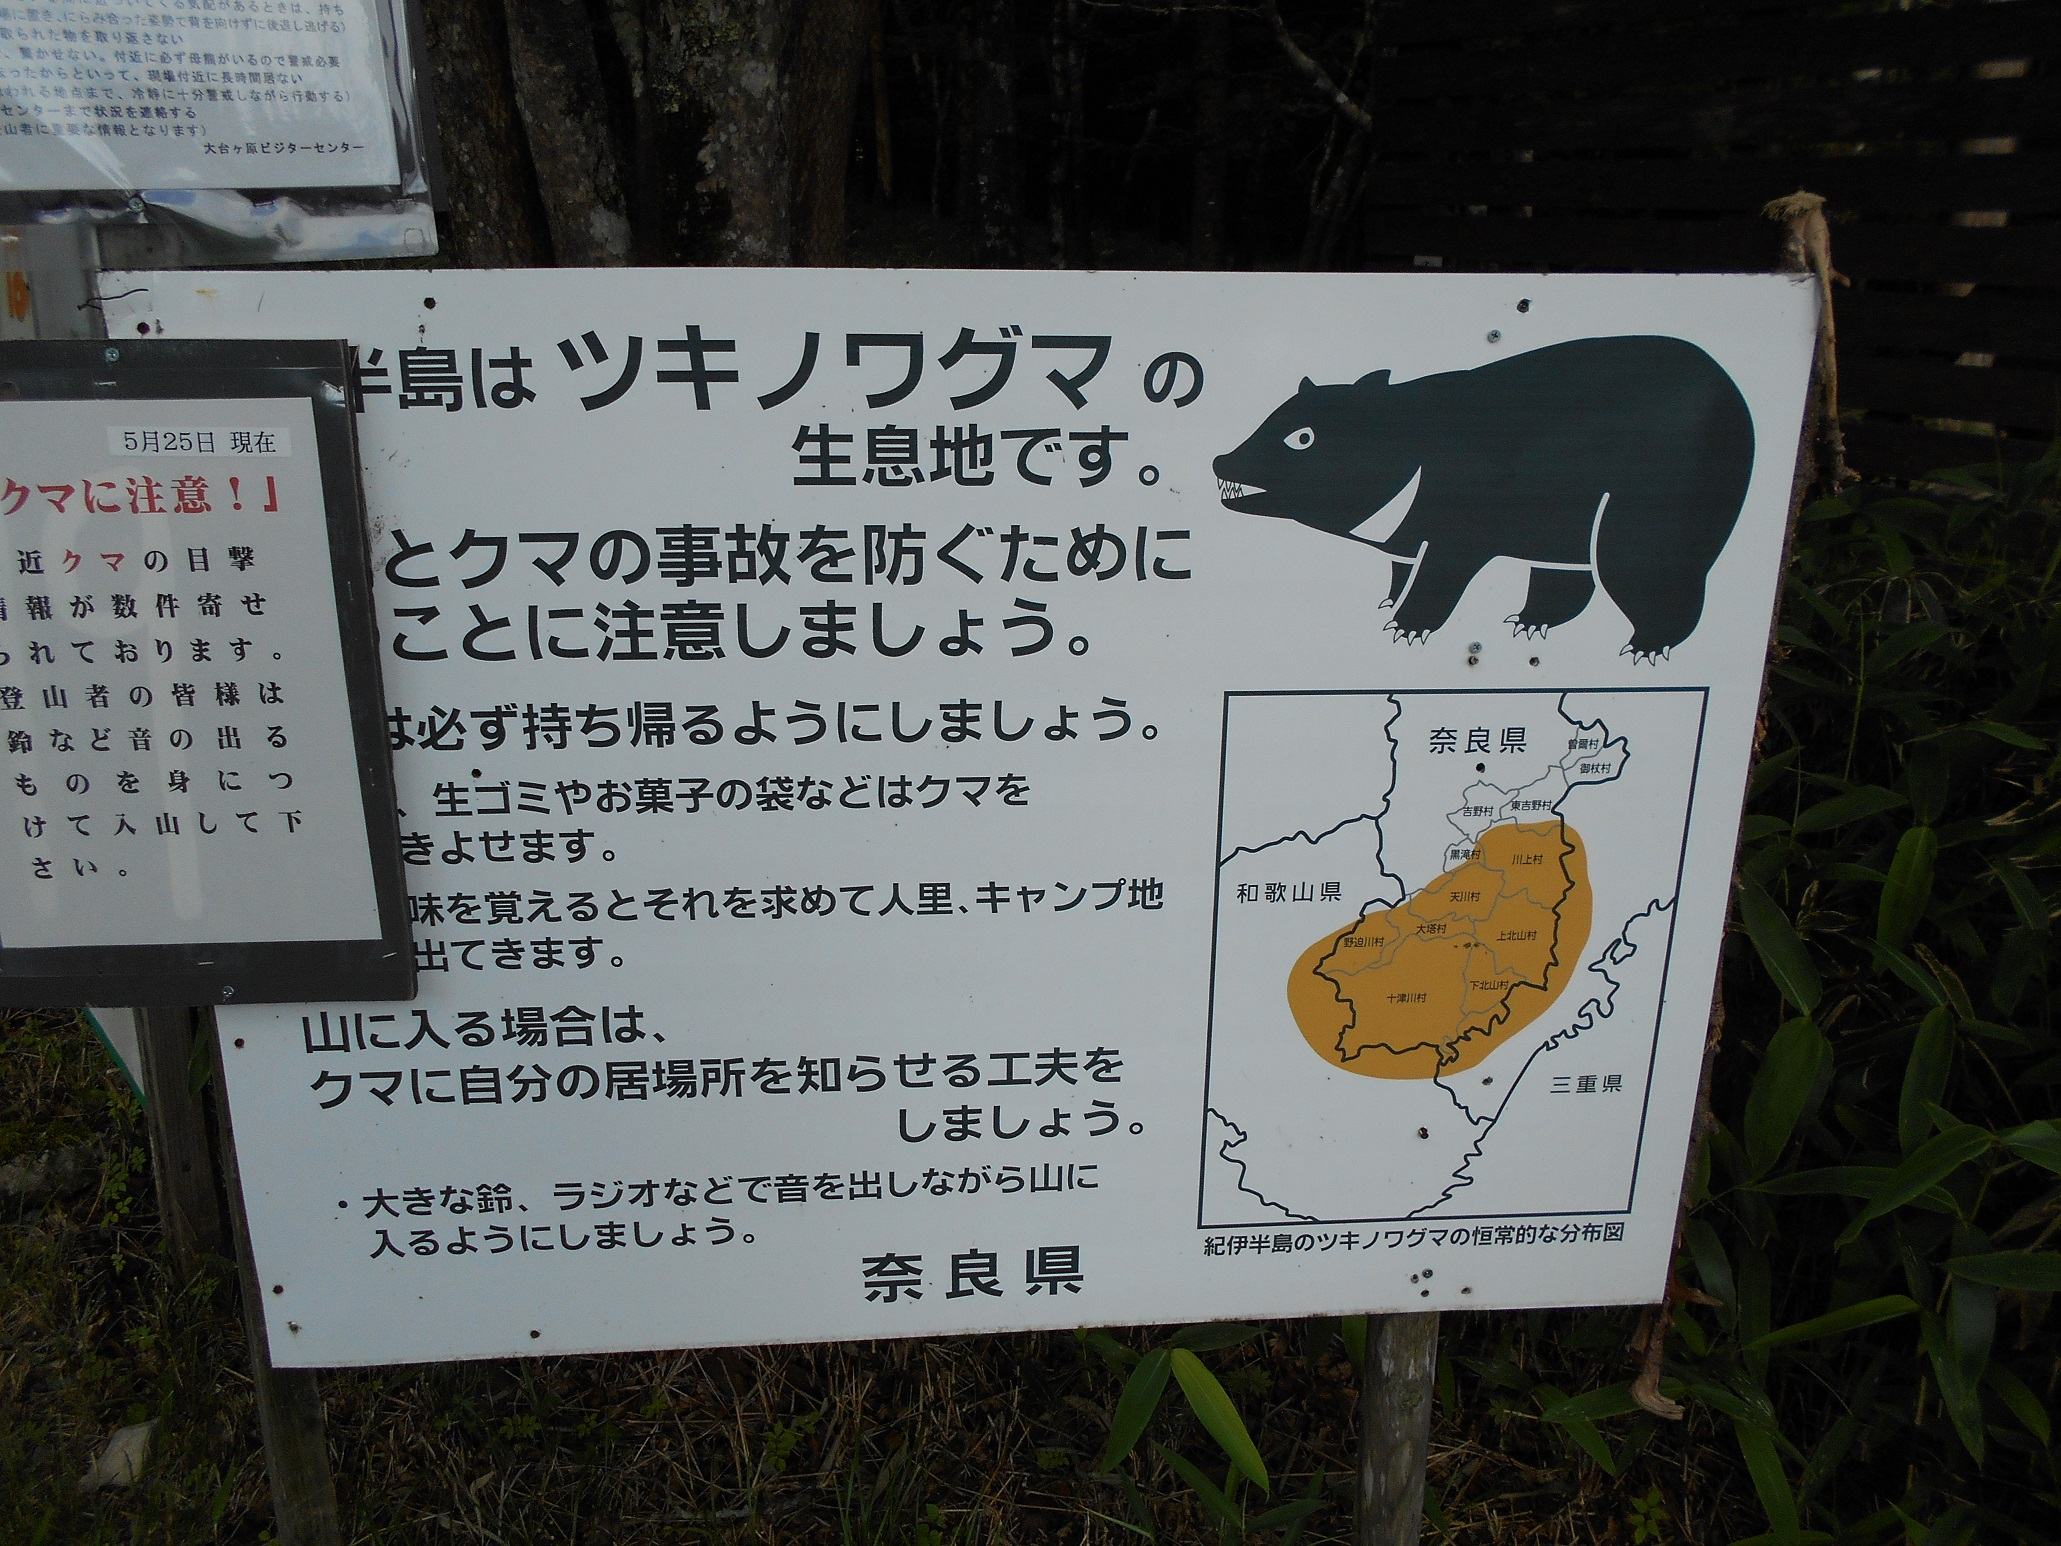 大台ケ原熊看板